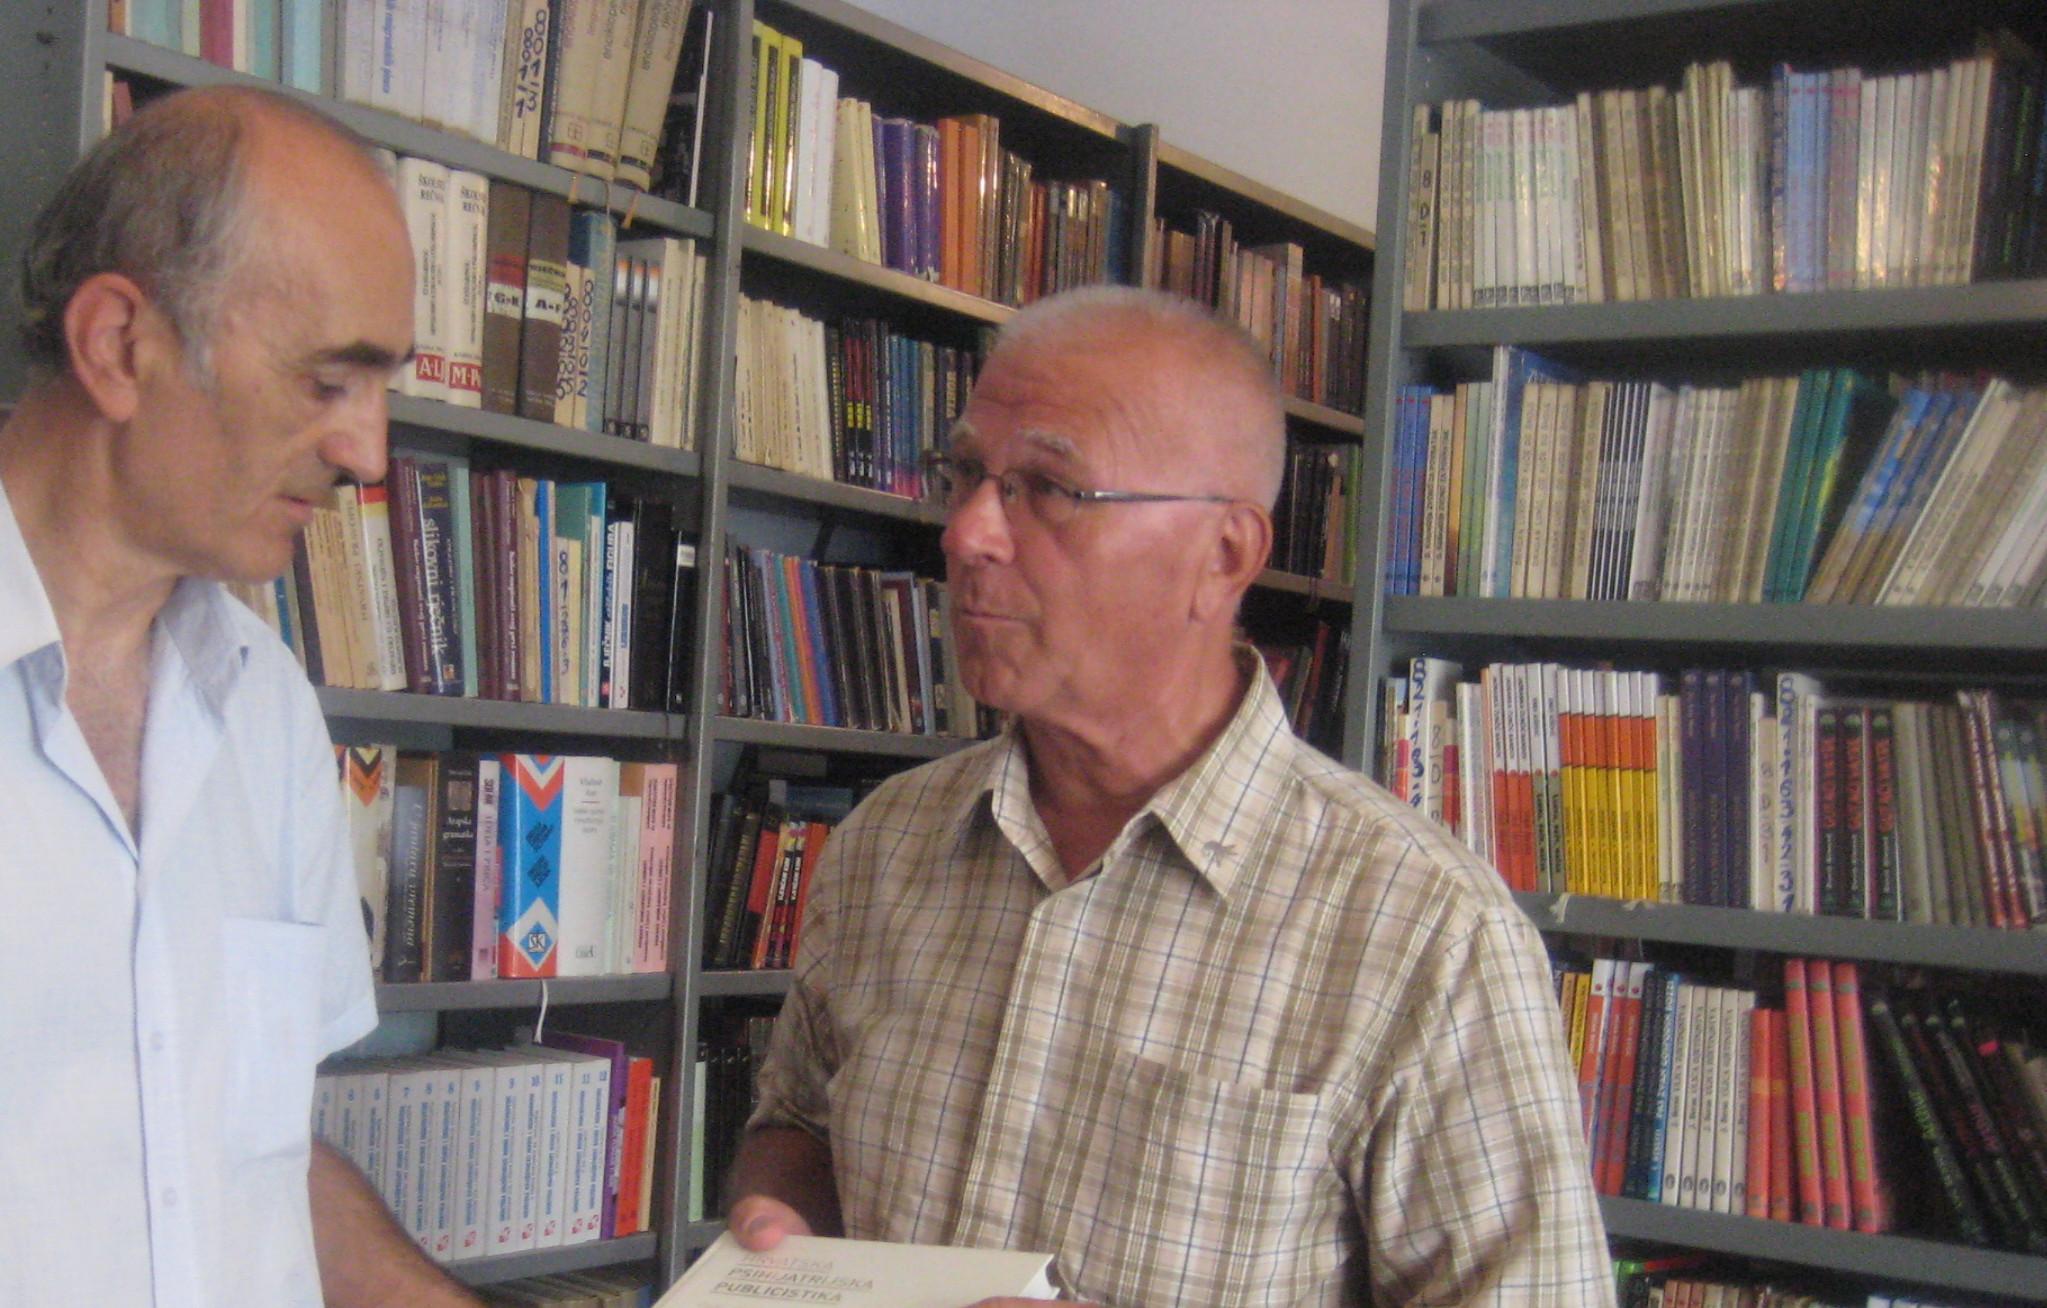 NARODNA KNJIŽNICA: Knjižni fond narastao na čak 27.300 knjiga